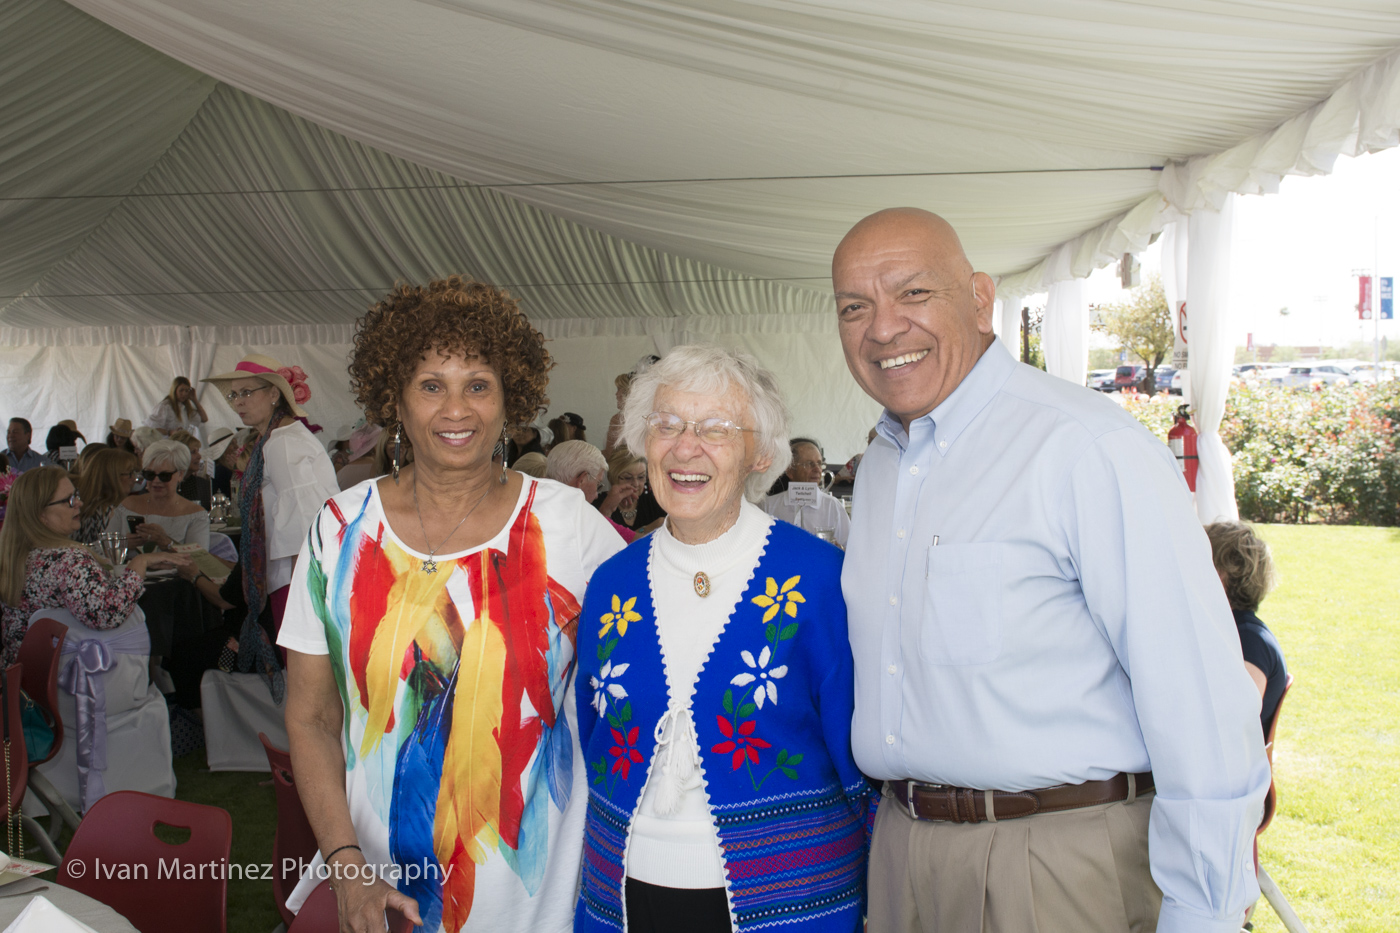 Participants at the Mesa Community College Rose Garden Tea Event